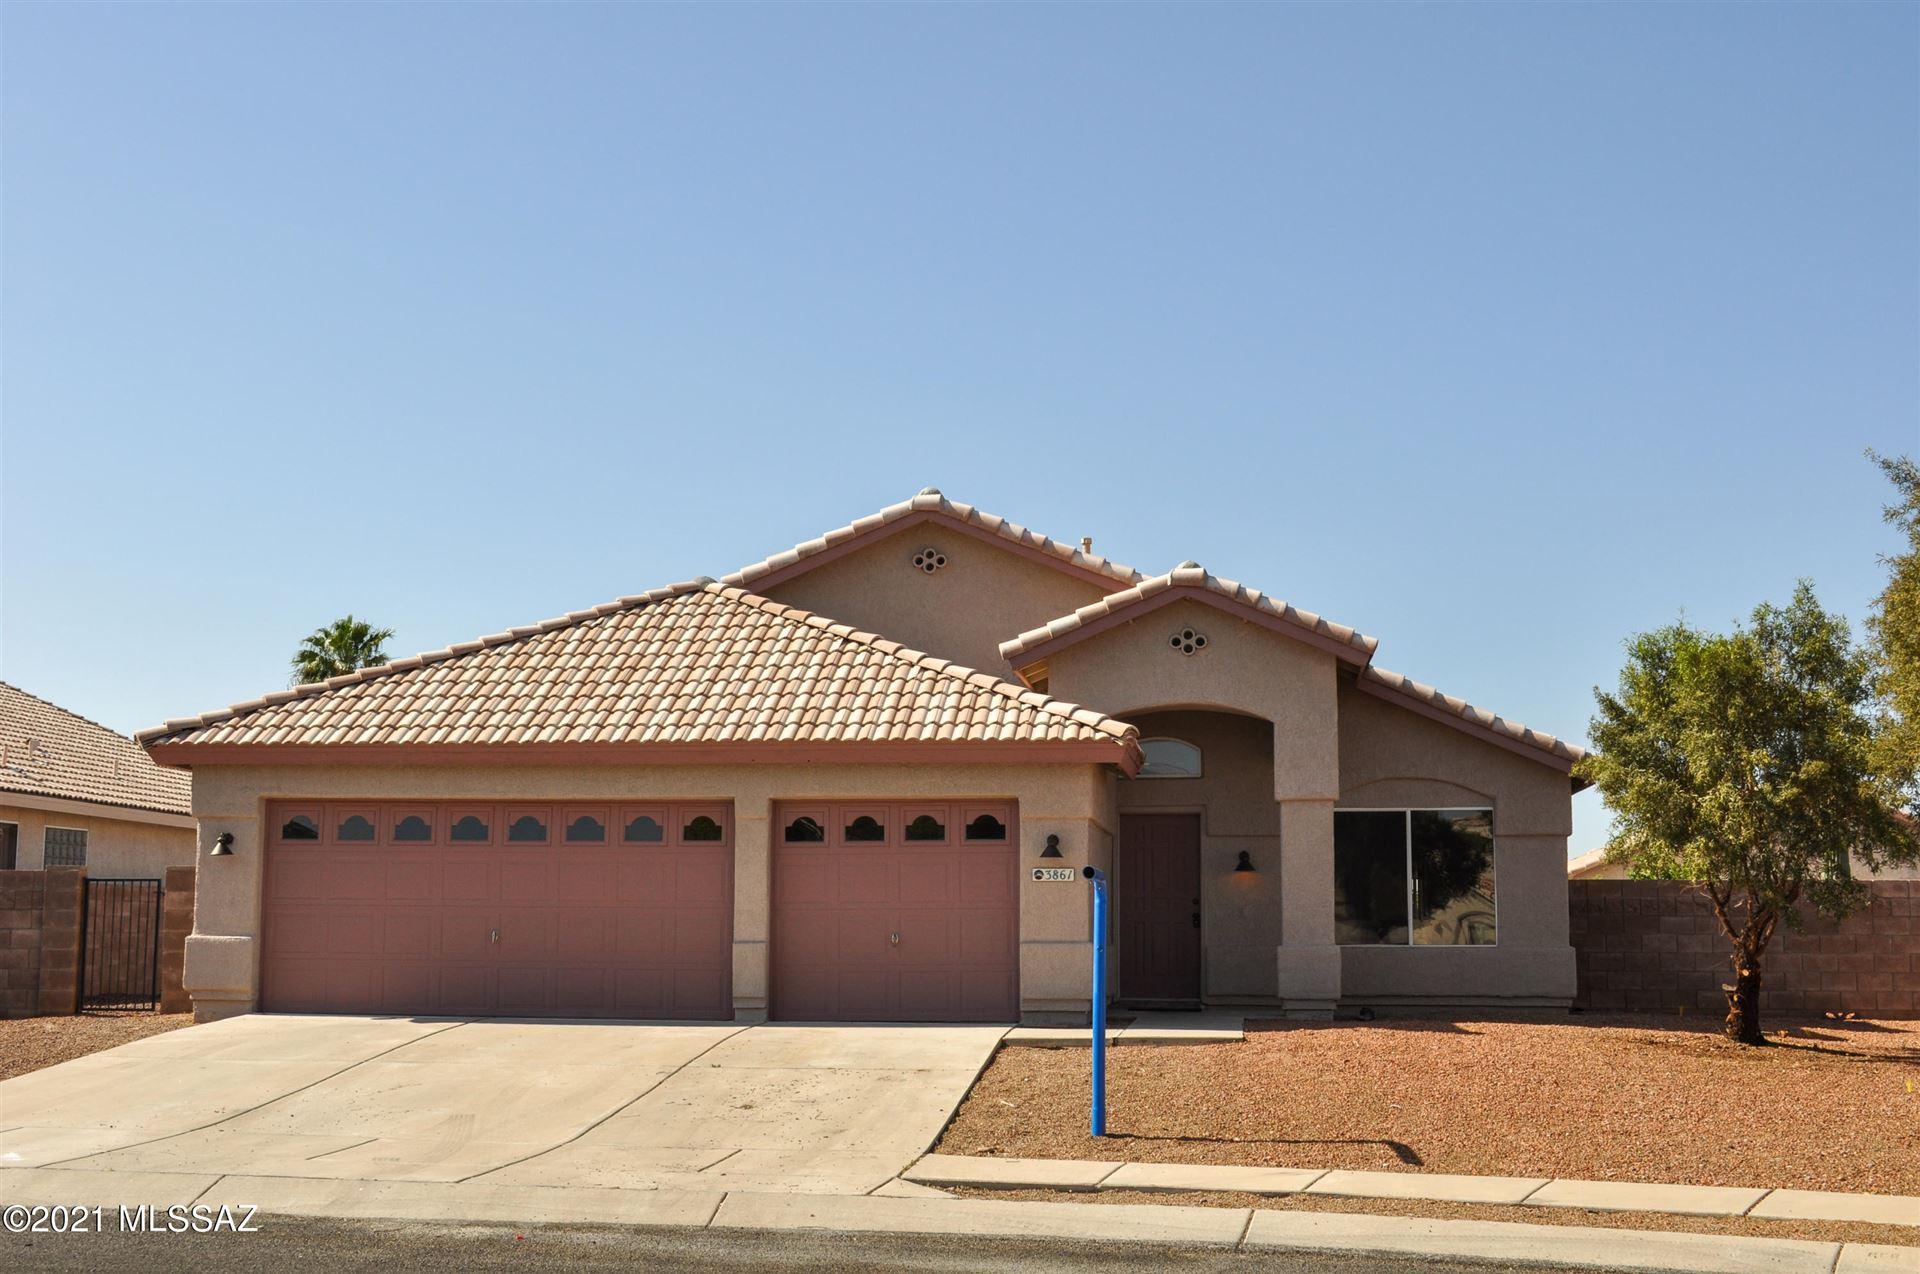 3861 W Carina Street, Tucson, AZ 85742 - #: 22112556